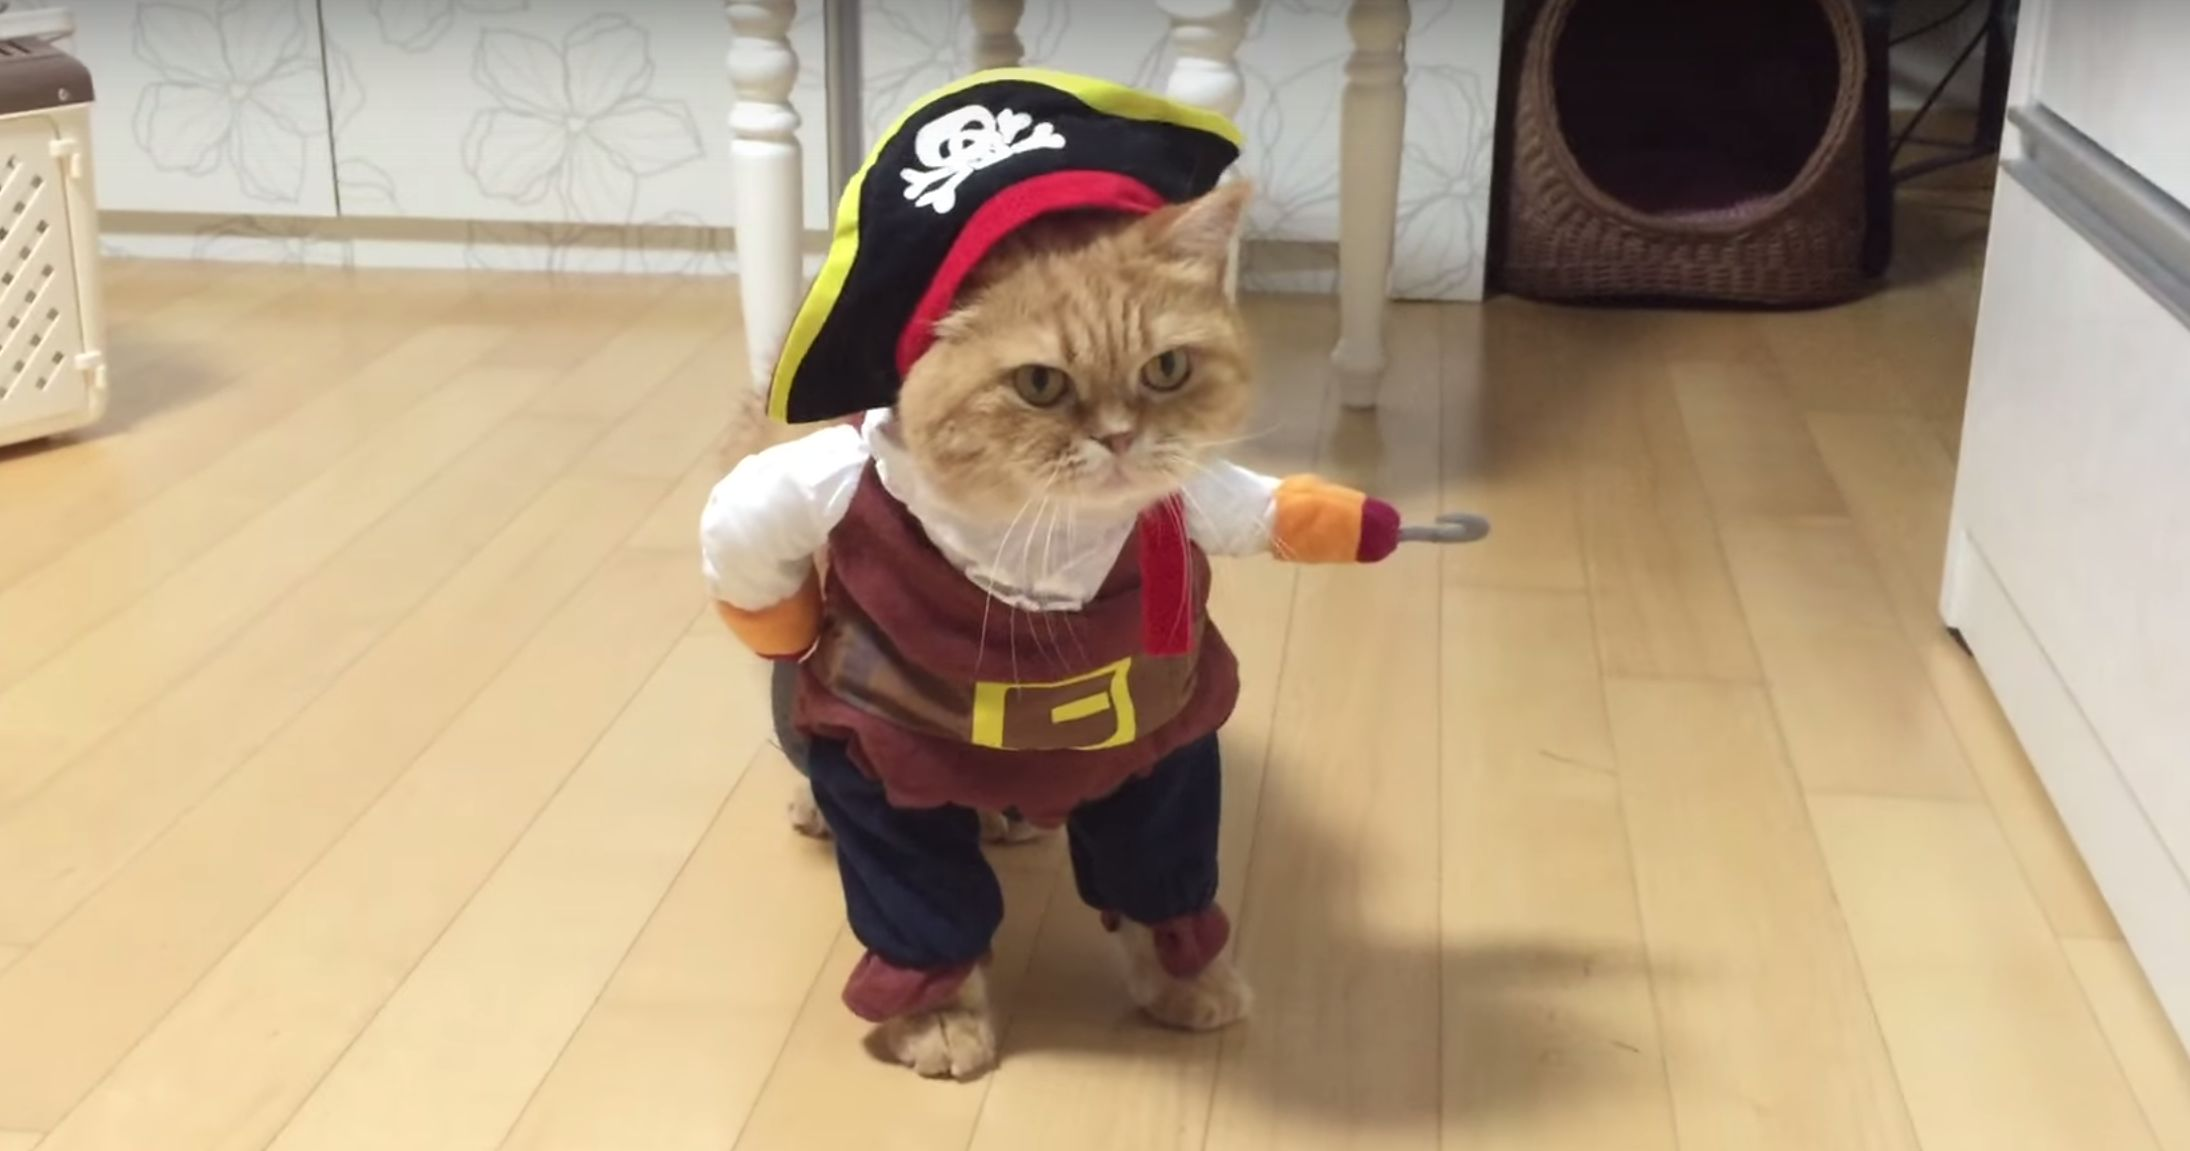 Pirate x gif pron famous hoe